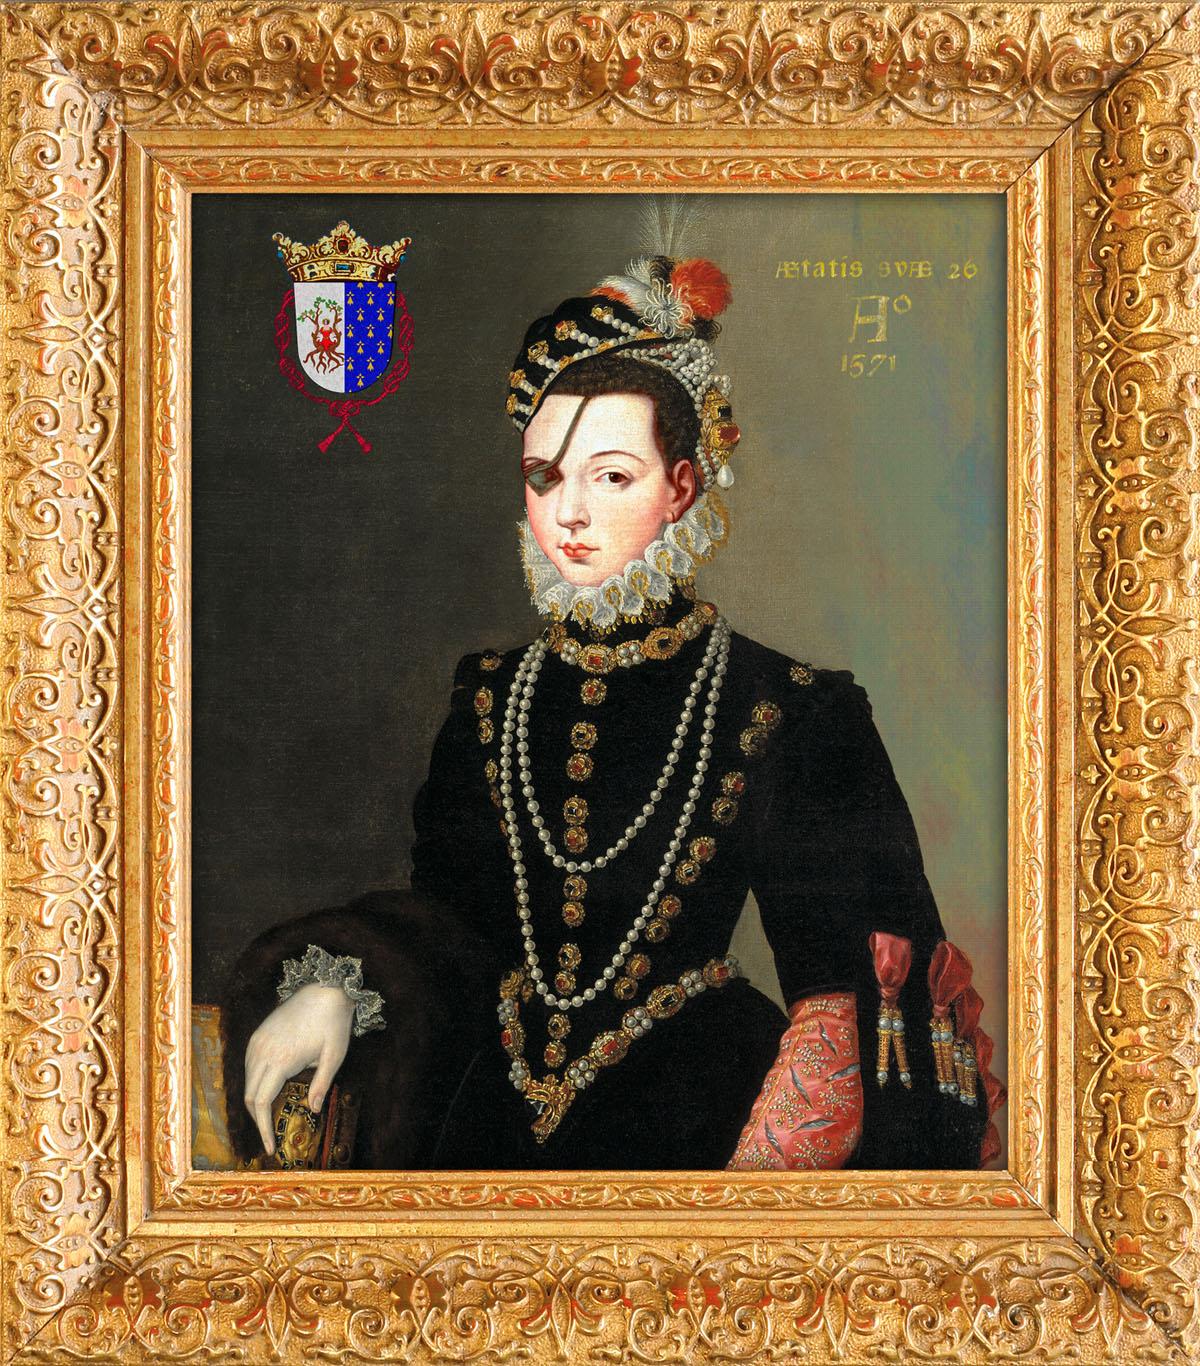 Speculative Genealogy #2: Princess Merit Margareta of Lorbeering, 1545 – 1620